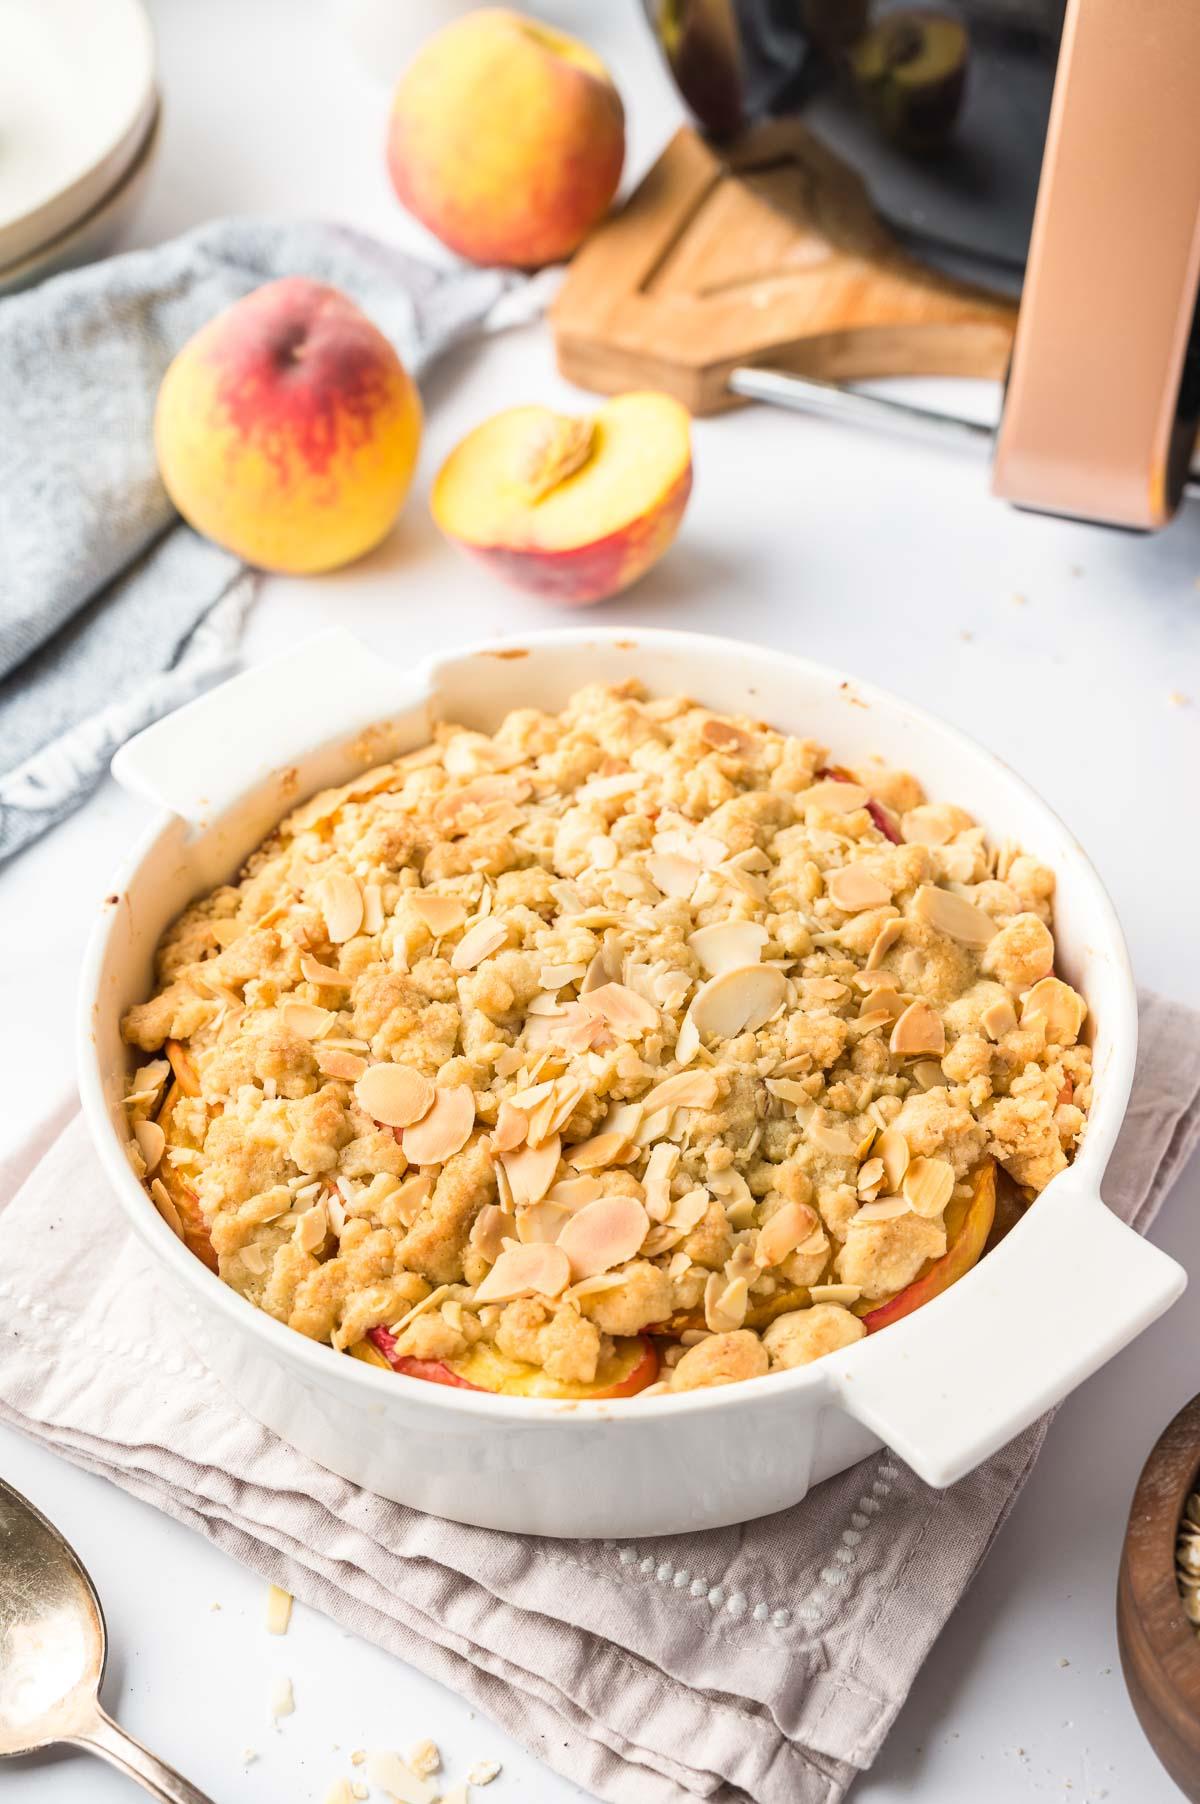 A peach crumble in a baking pan next to some peaches